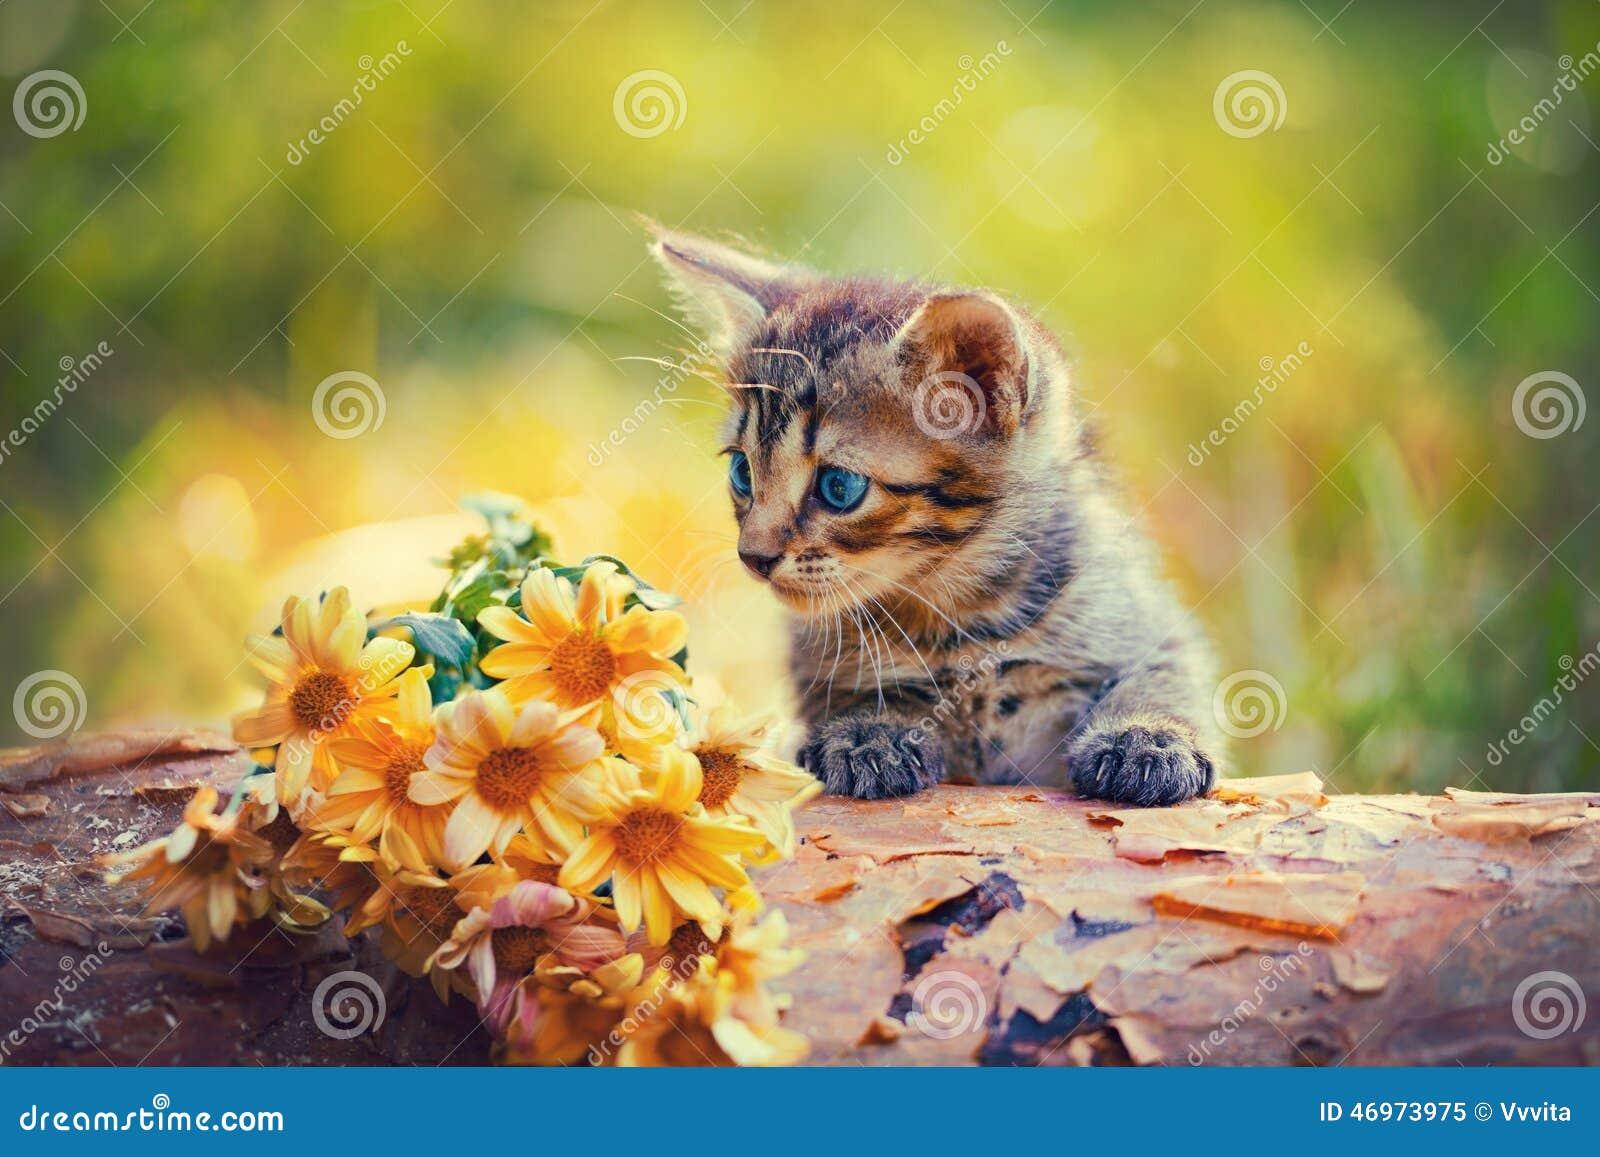 Kitten looking at flowers